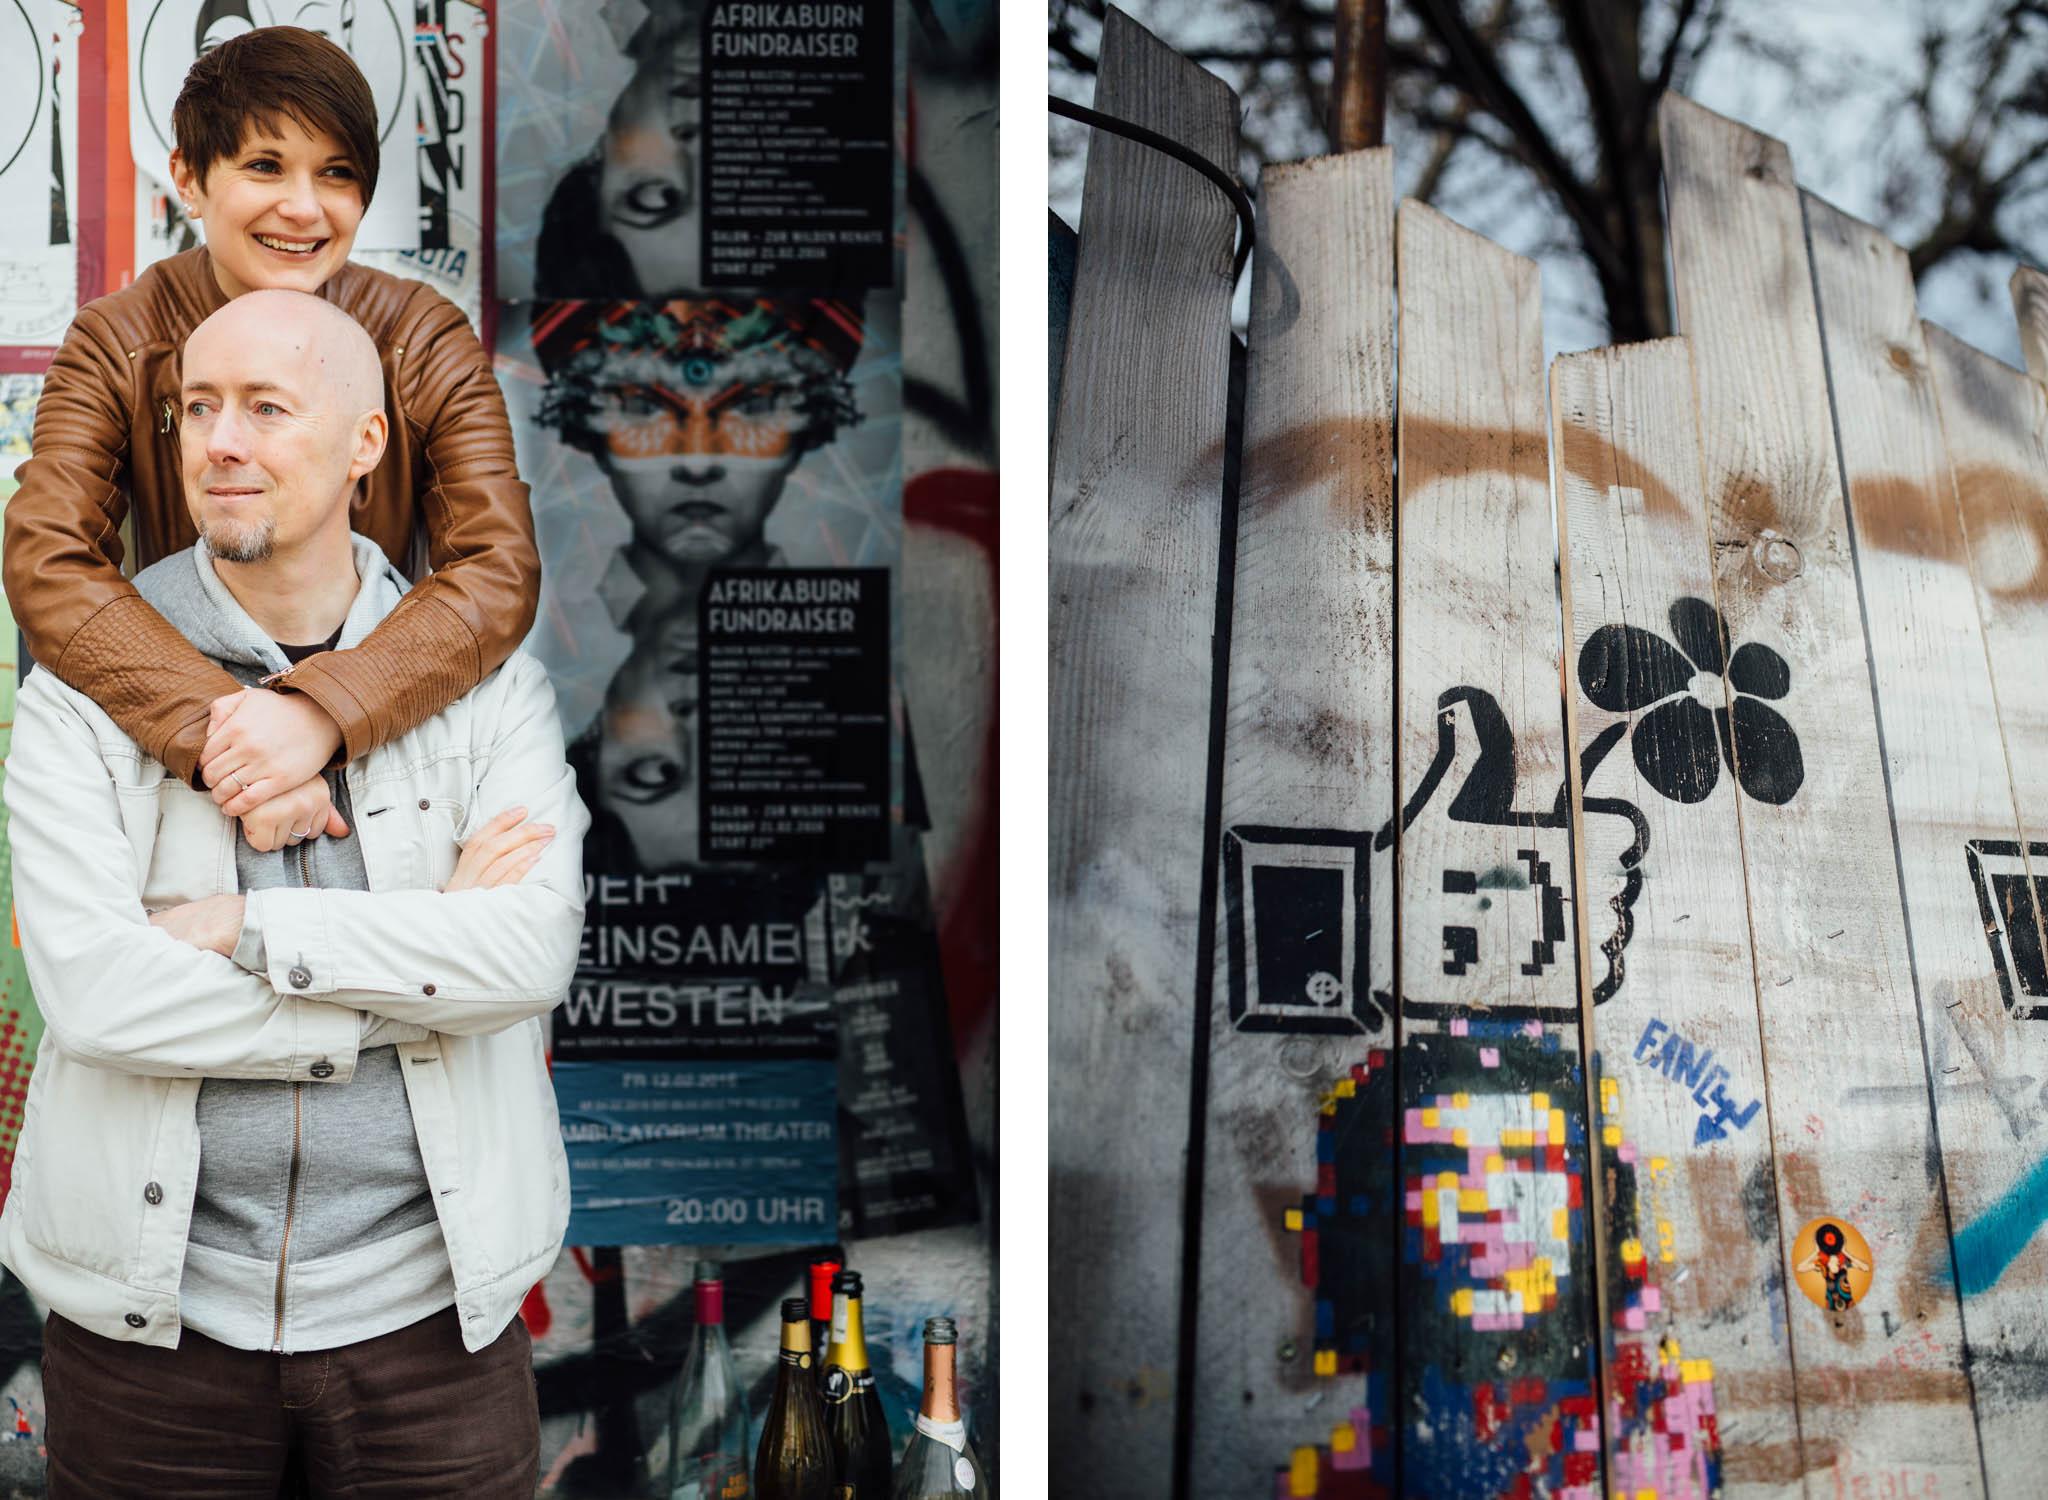 hochzeitsfotos-portraits-paarshooting-berlin-engagement